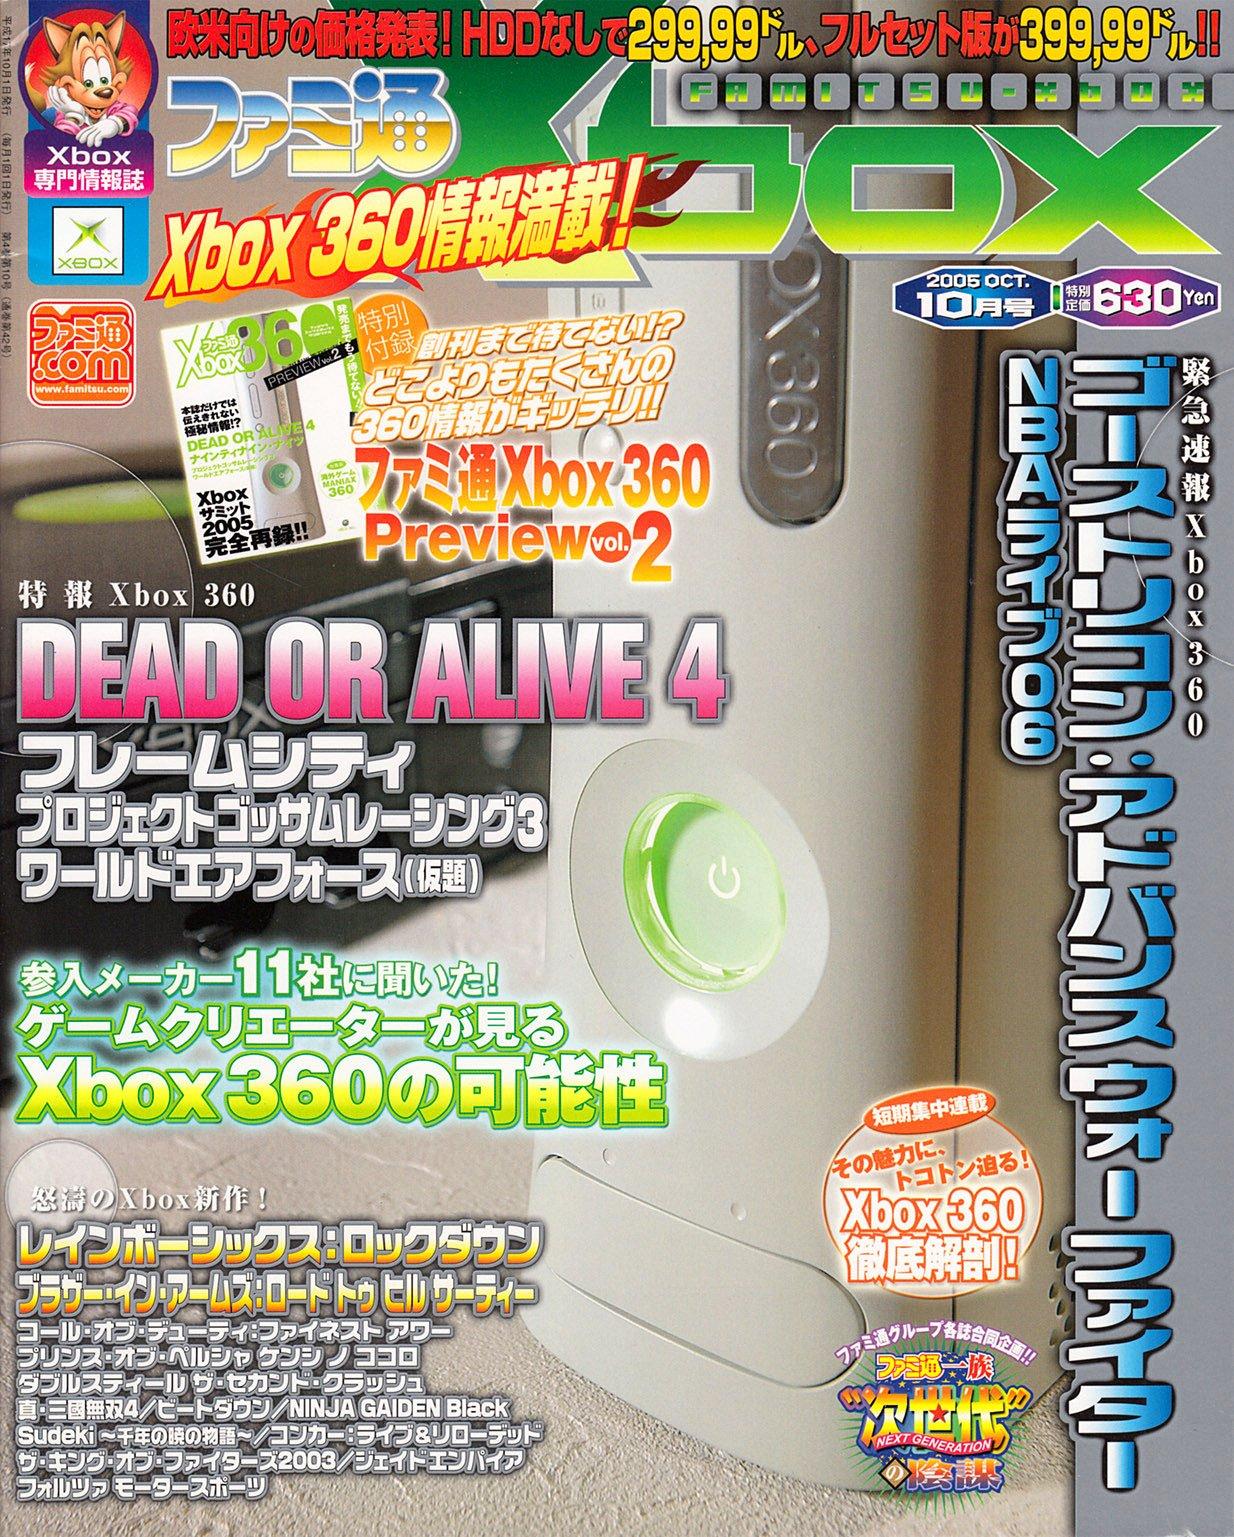 Famitsu Xbox Issue 044 (October 2005)